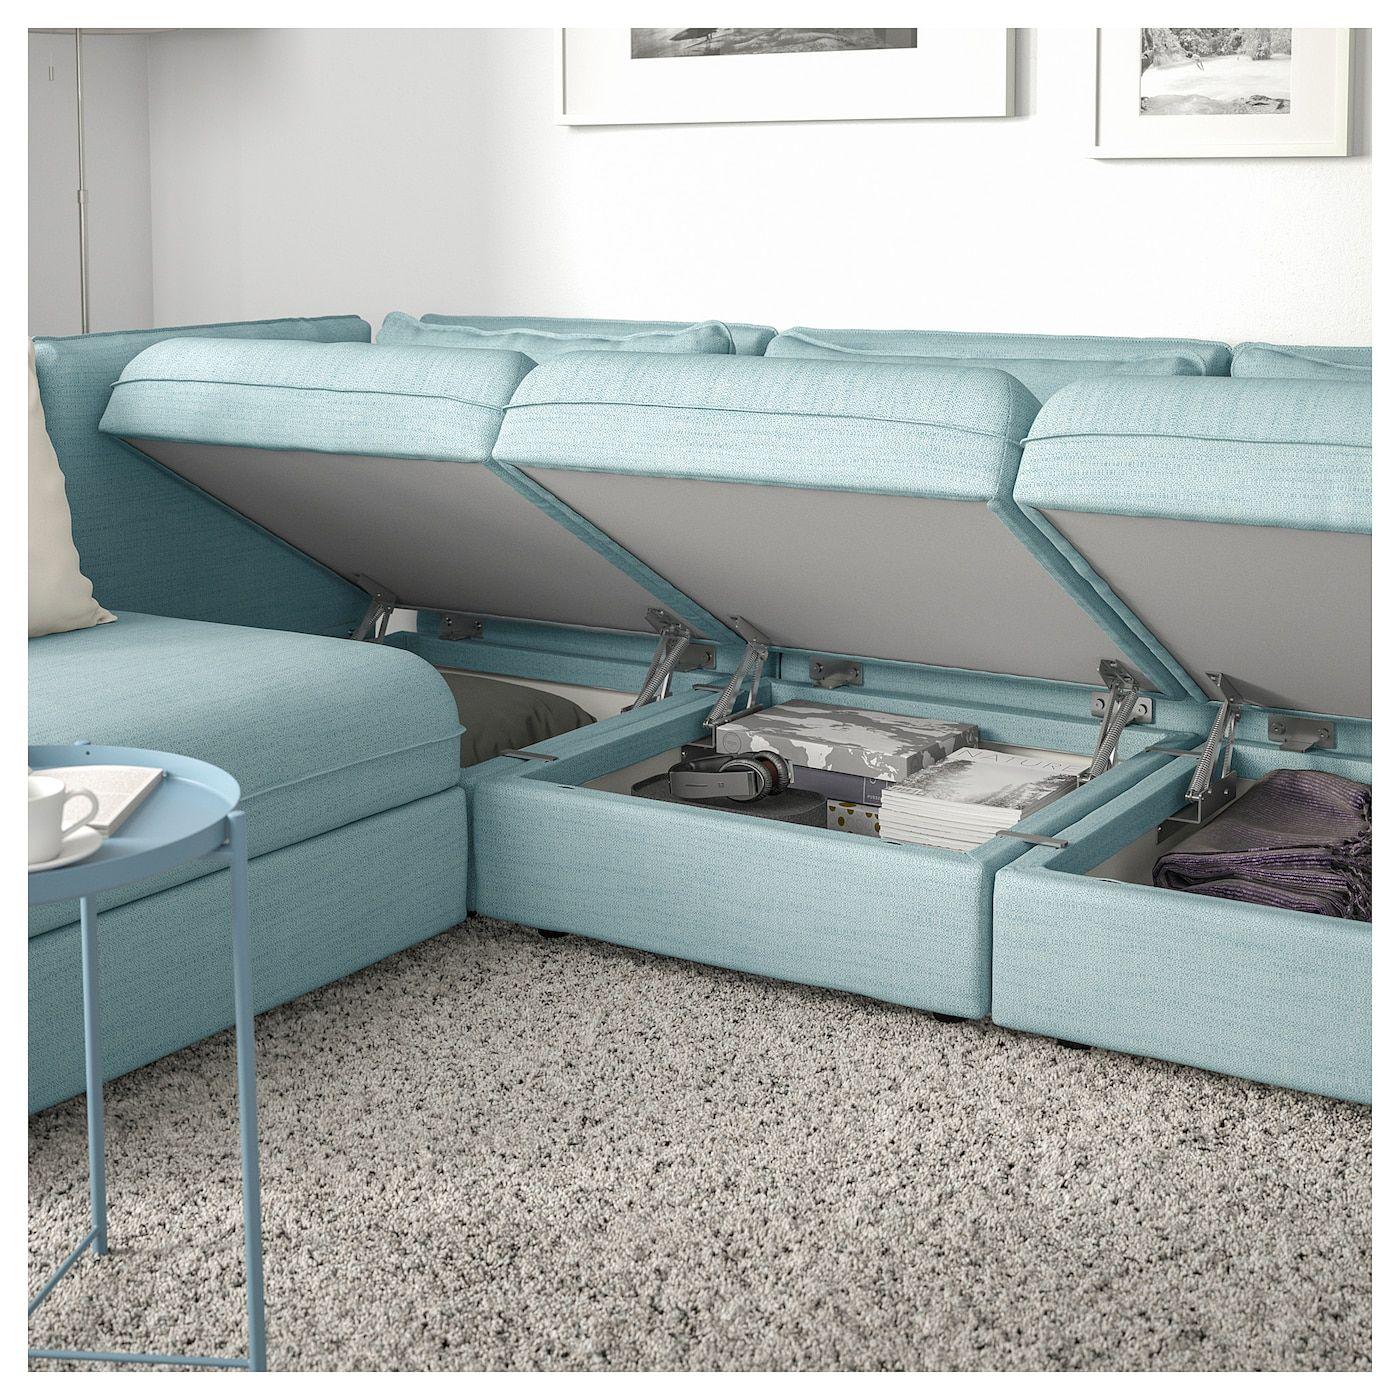 IKEA - VALLENTUNA Modular corner sofa, 3-seat with storage, Hillared